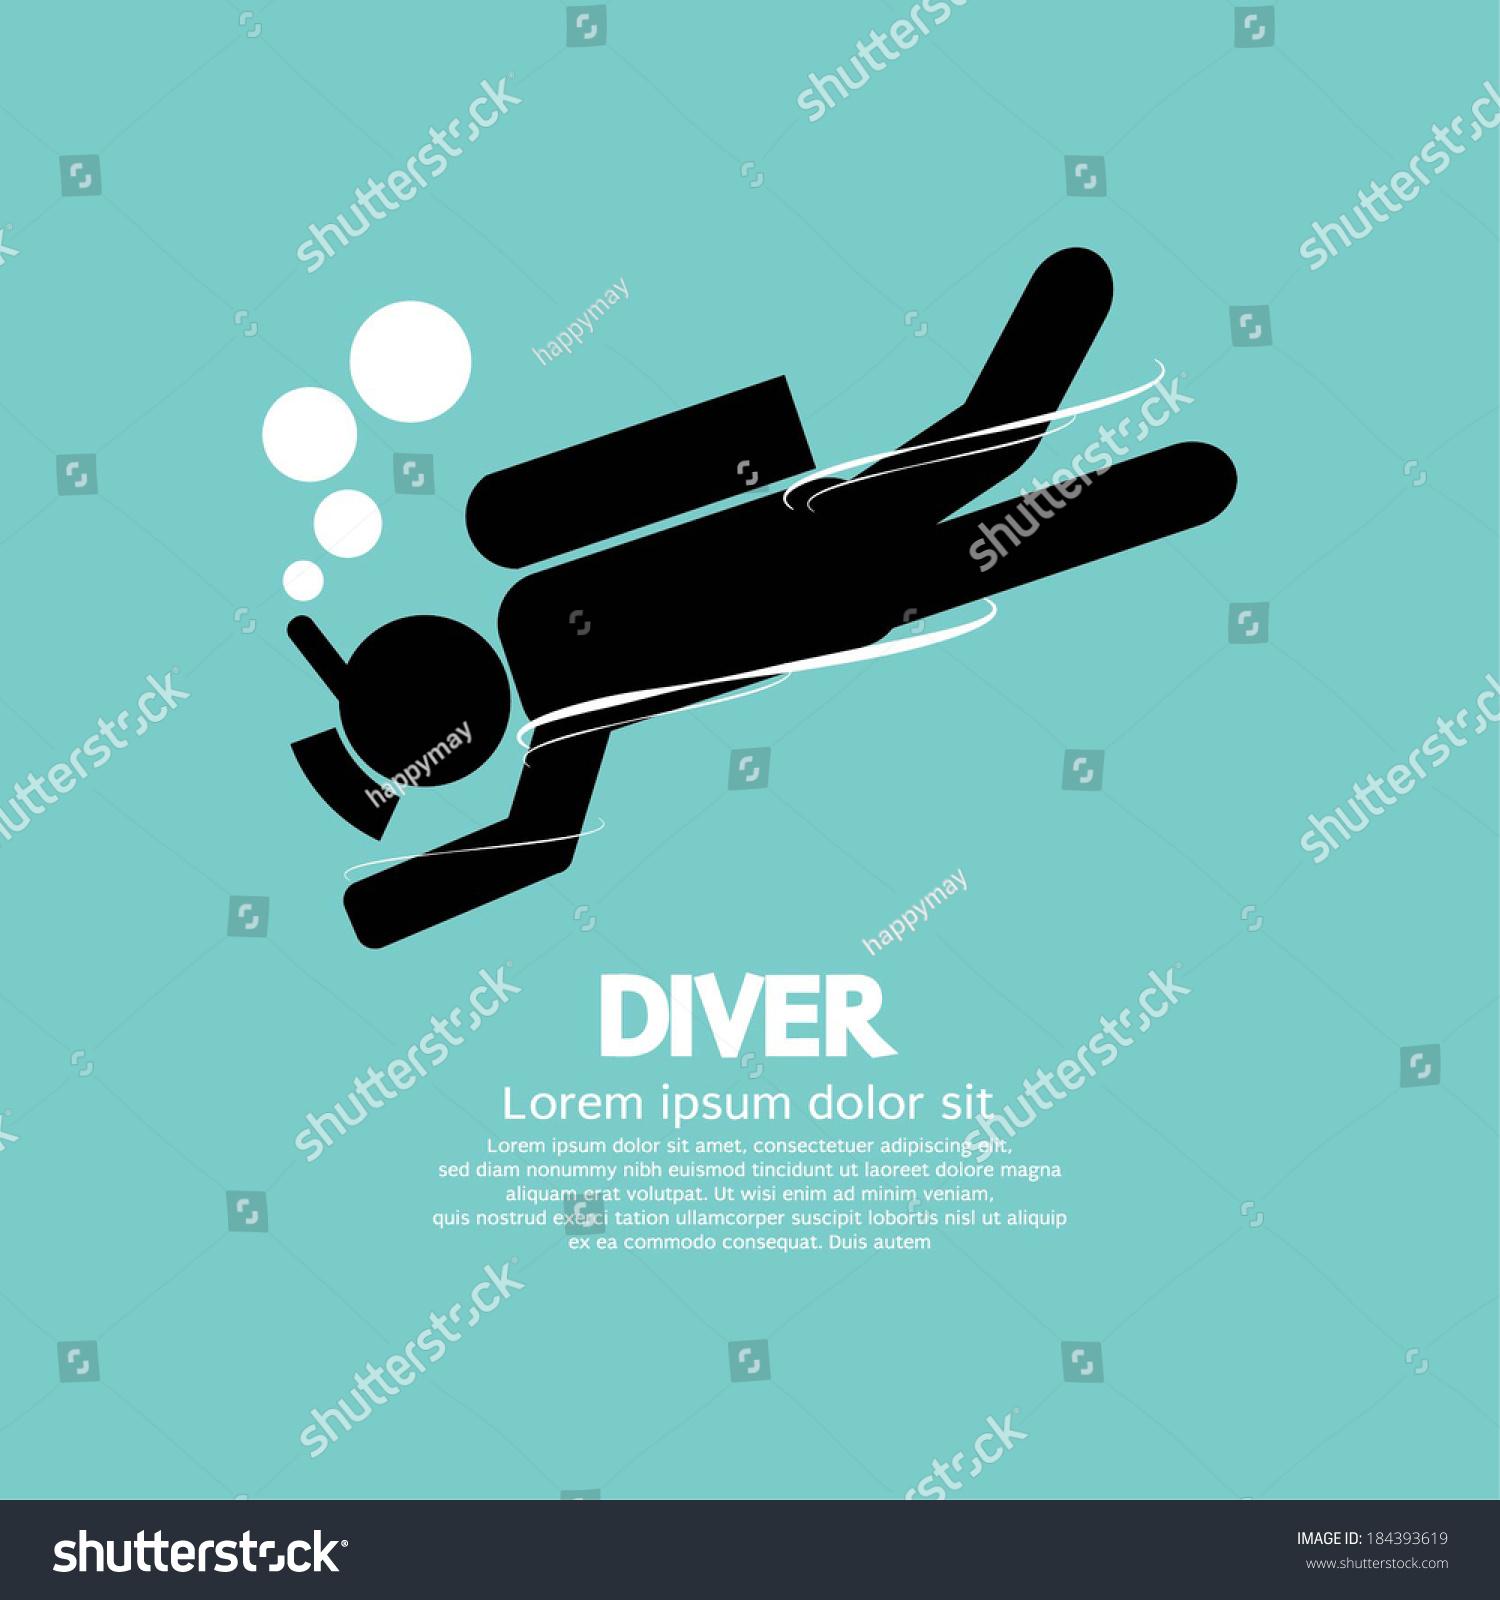 Stock Vector Diver Vector Illustration